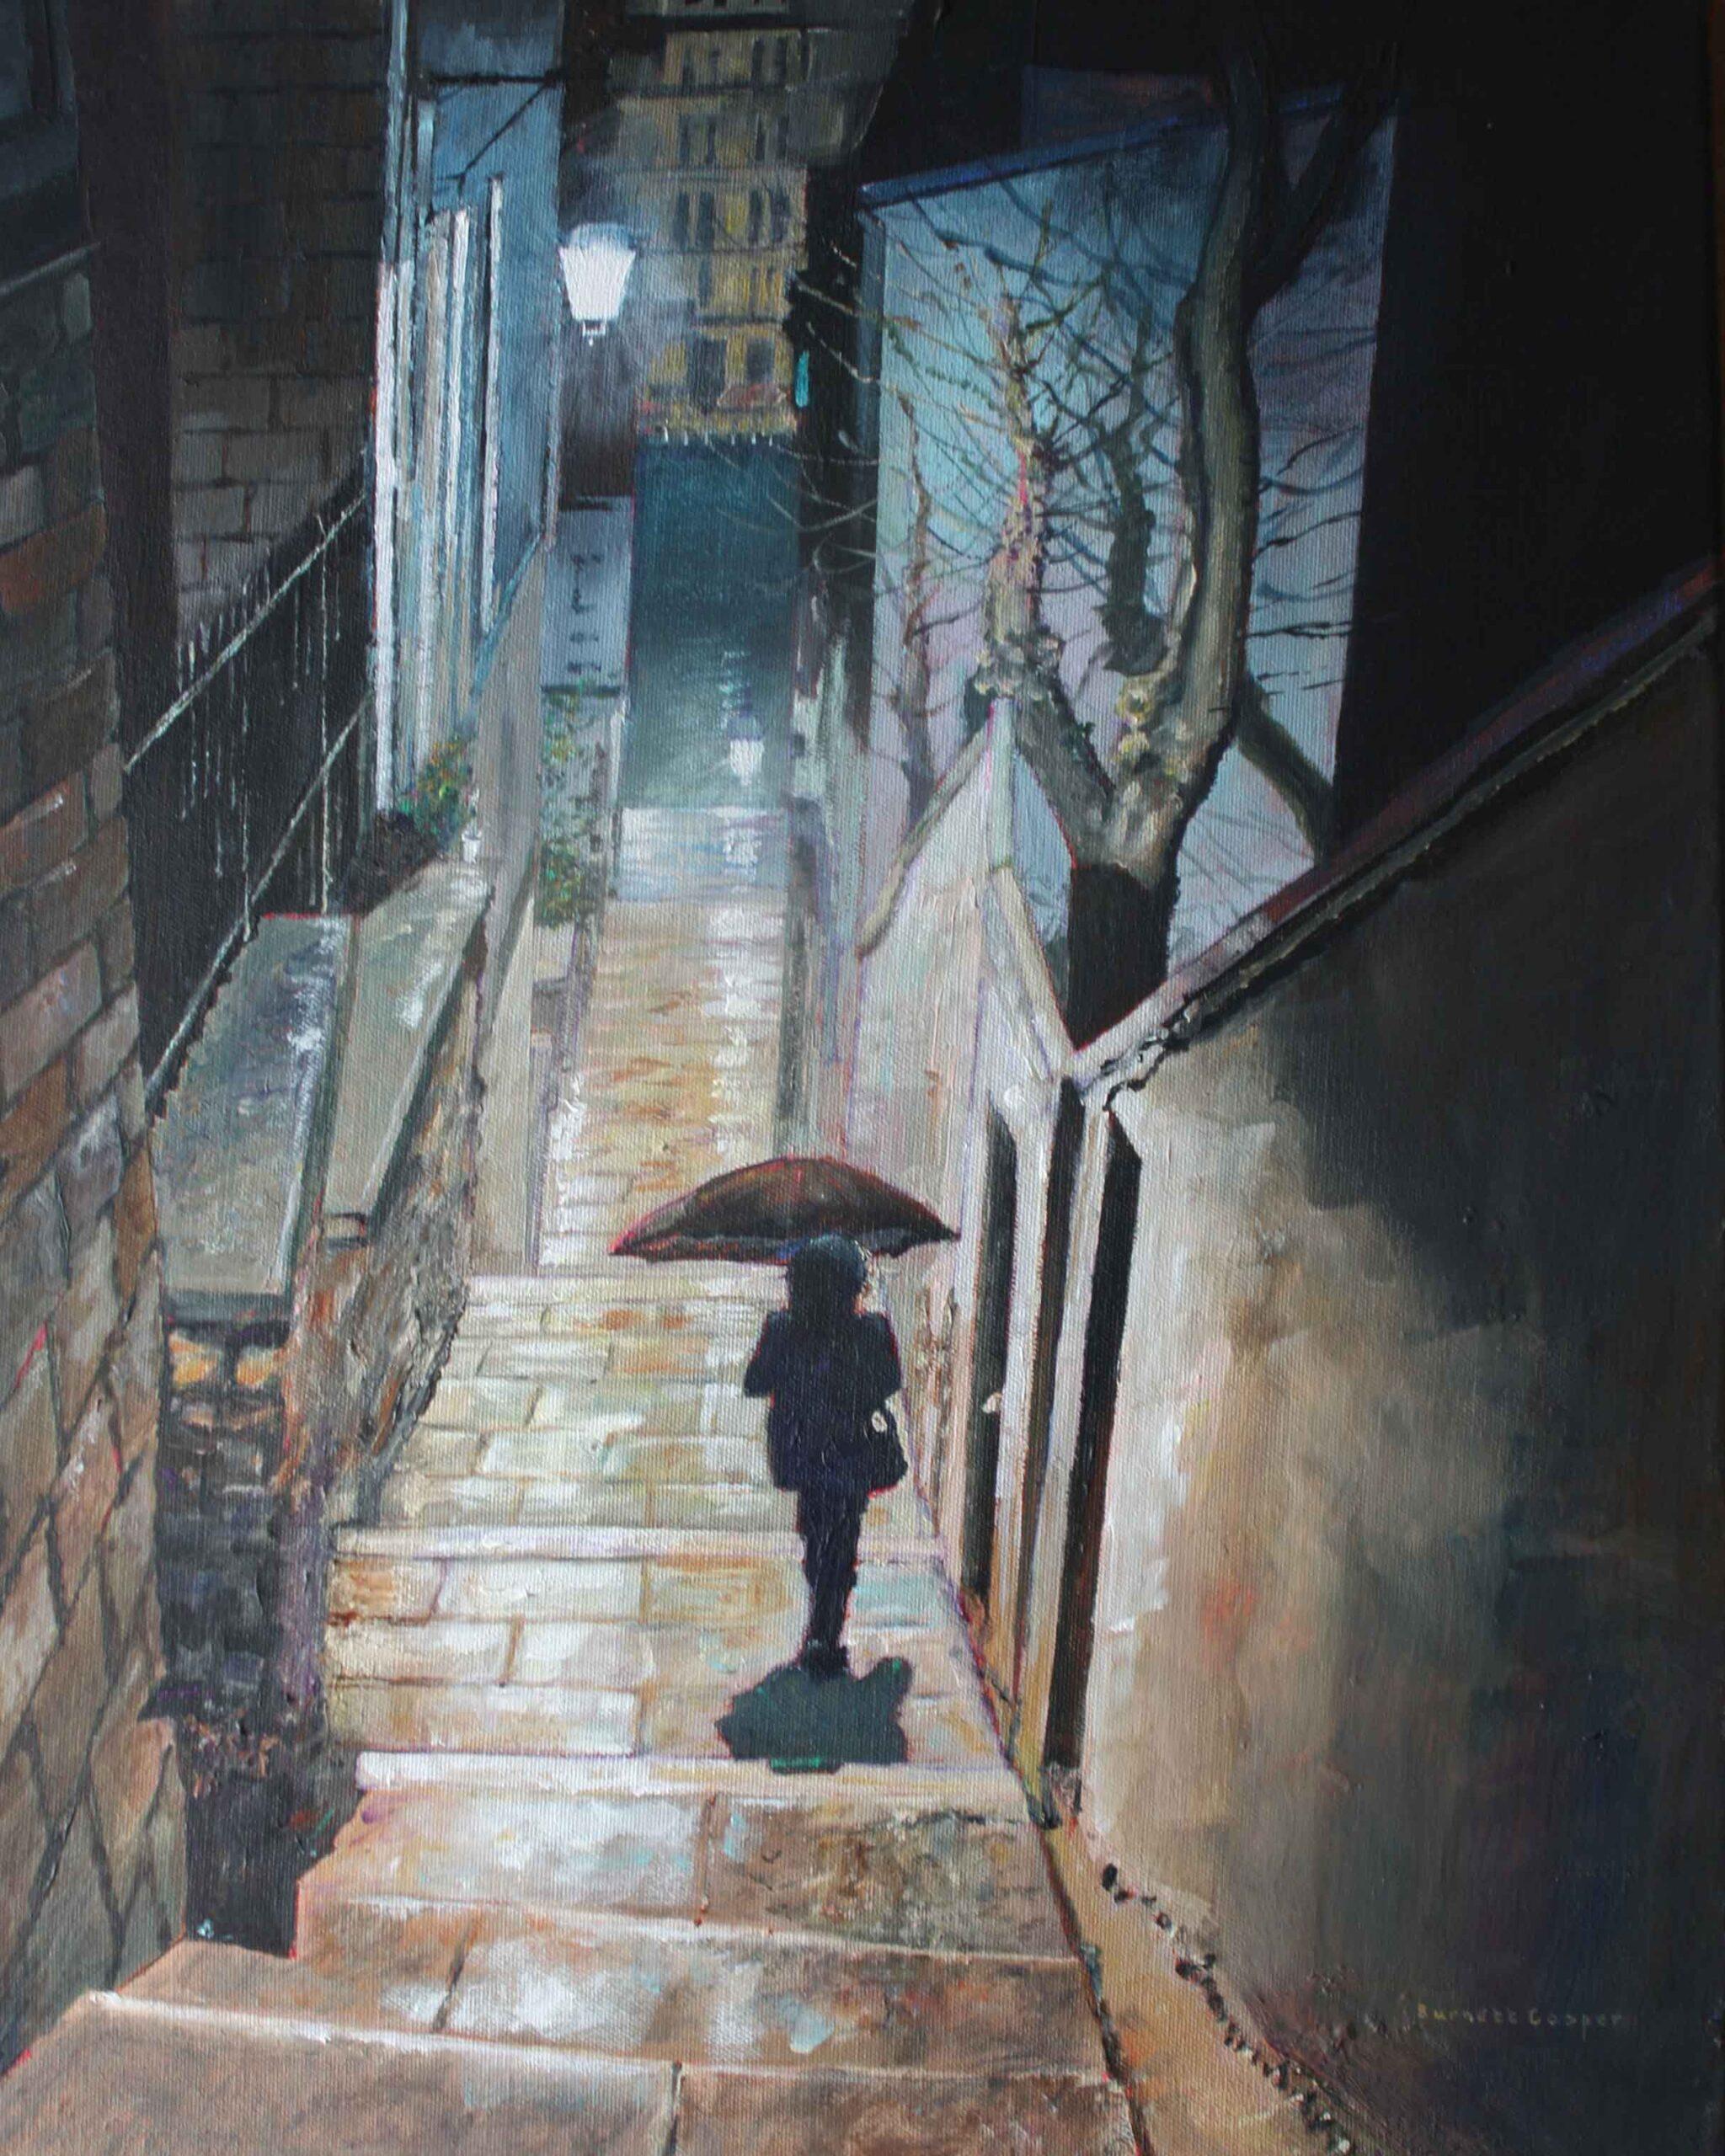 Steps by Montmartre. Hilary Burnett Cooper. Jackson's Painting Prize.